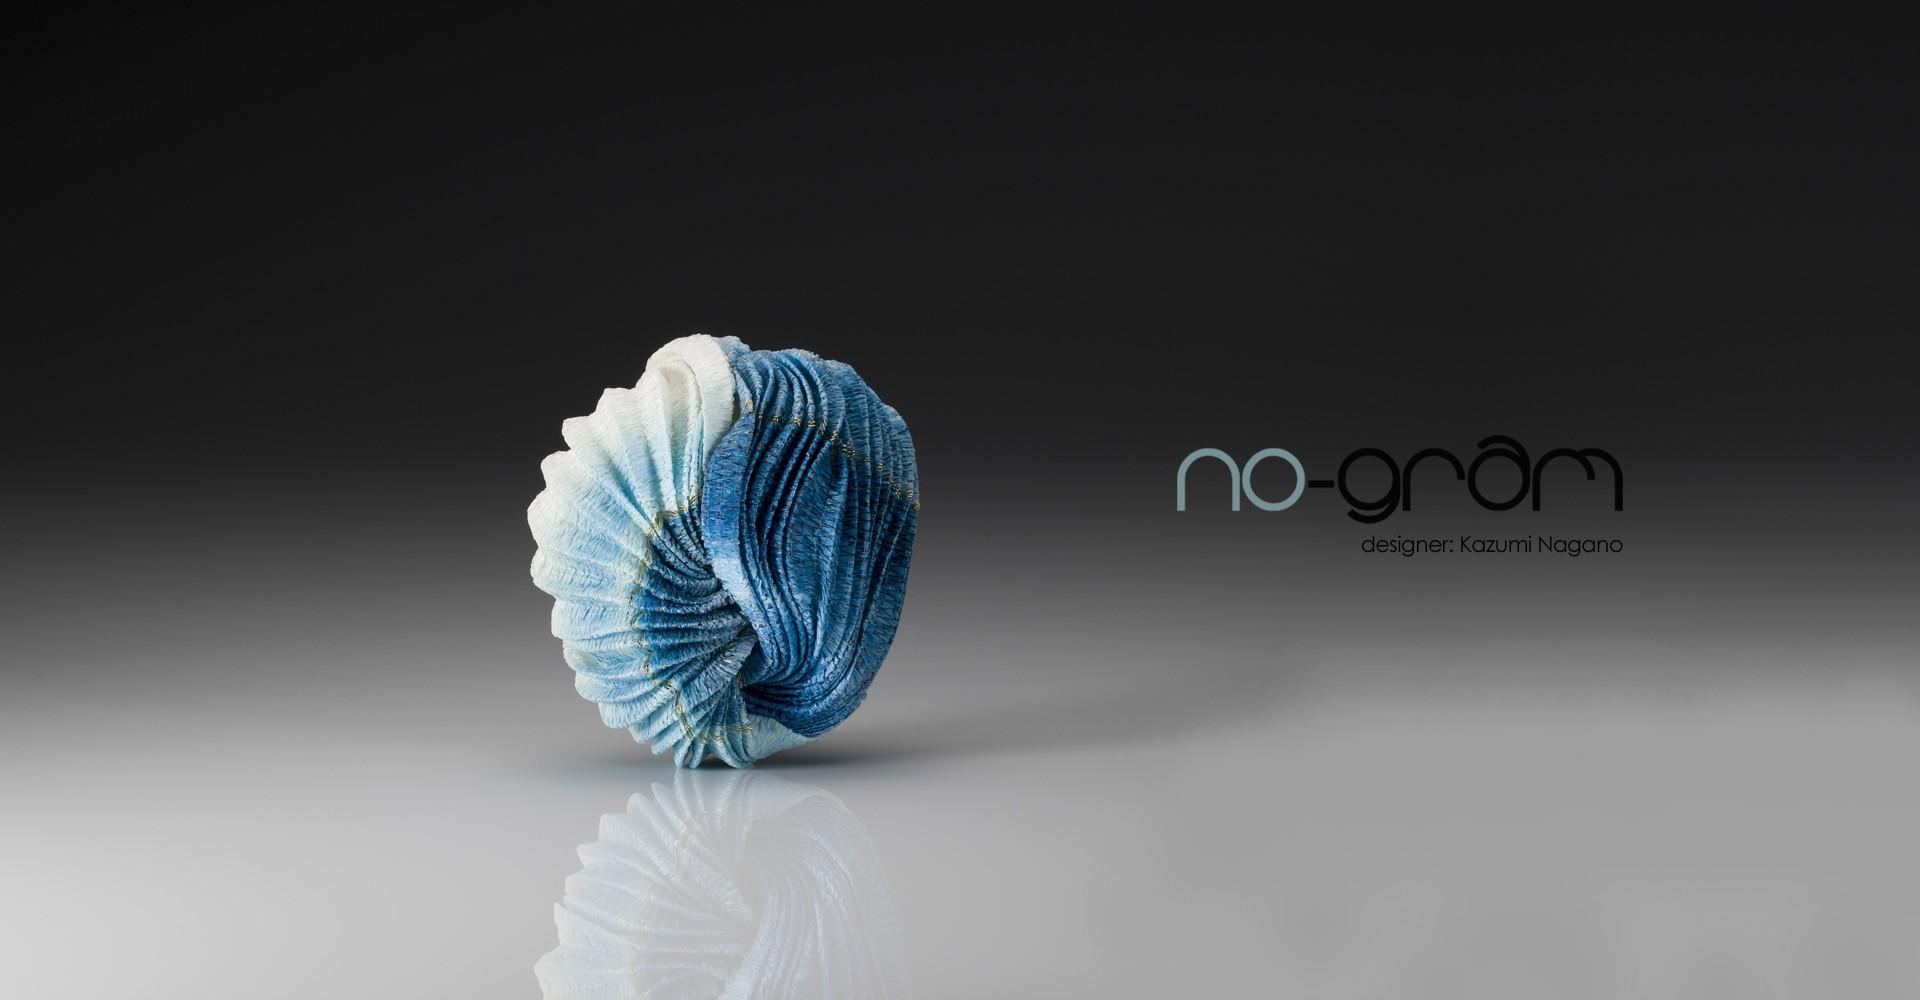 Kazumi_Nagano - Japanese designer | no-gram |